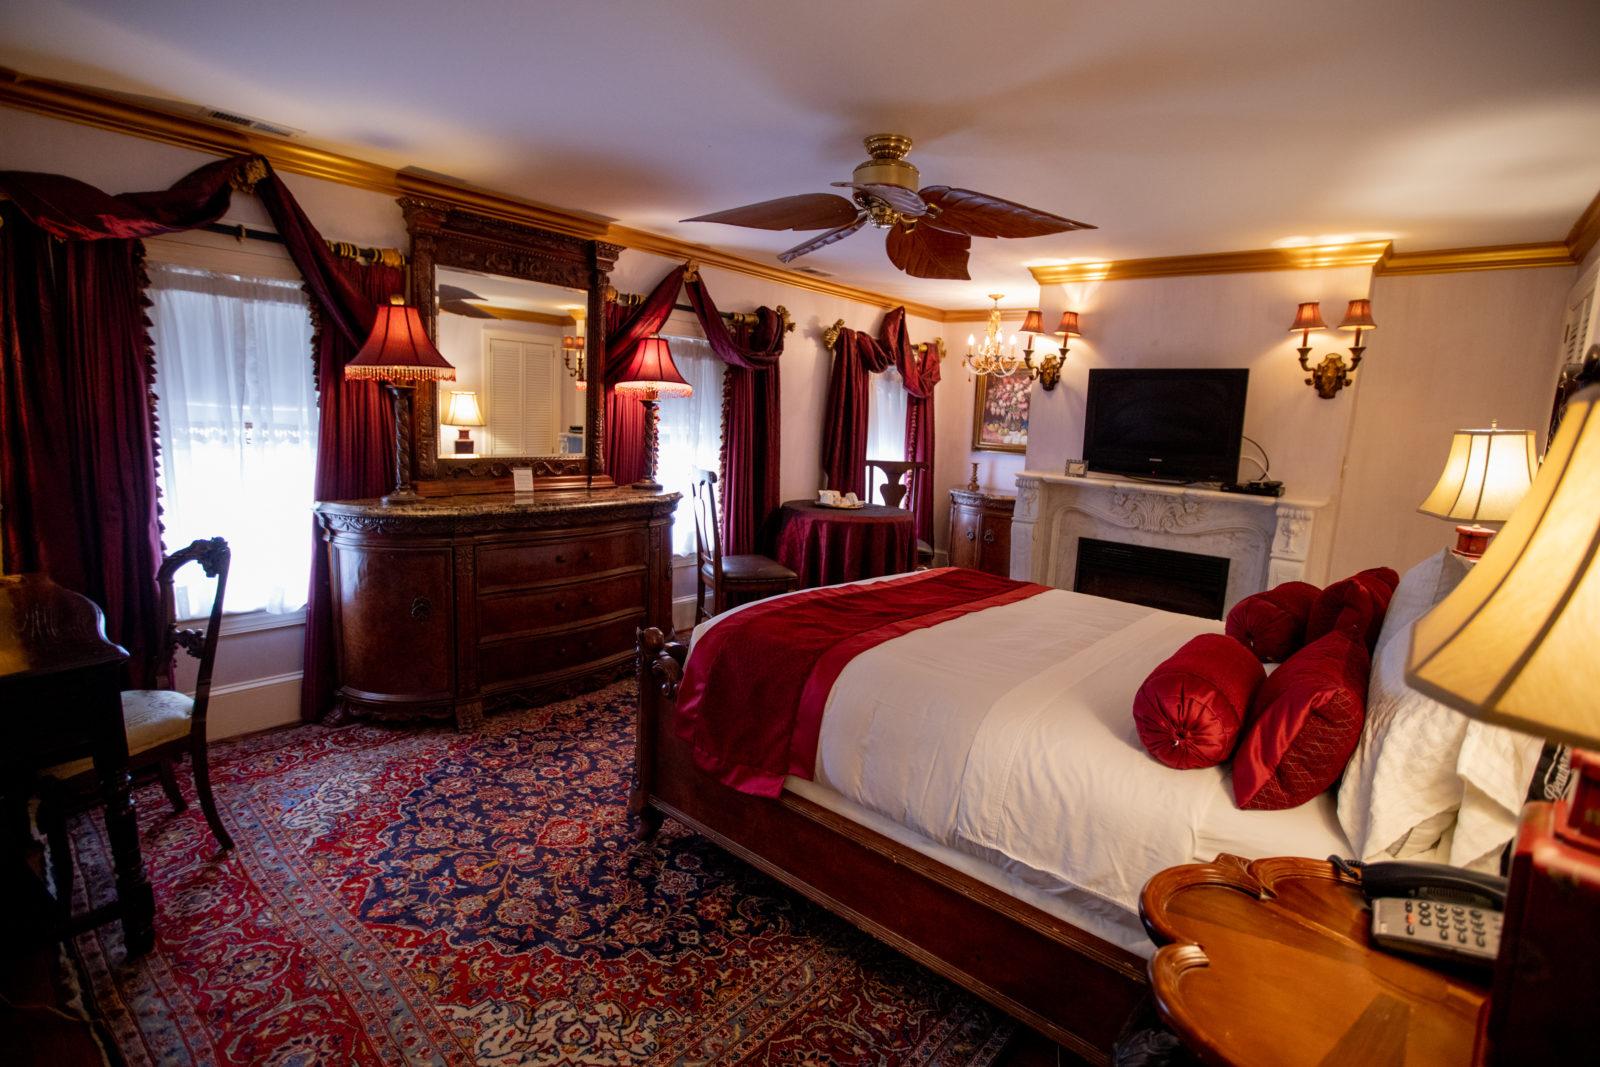 https://www.1840splaza.com/wp-content/uploads/2018/10/Estate-Room-303-2.jpg